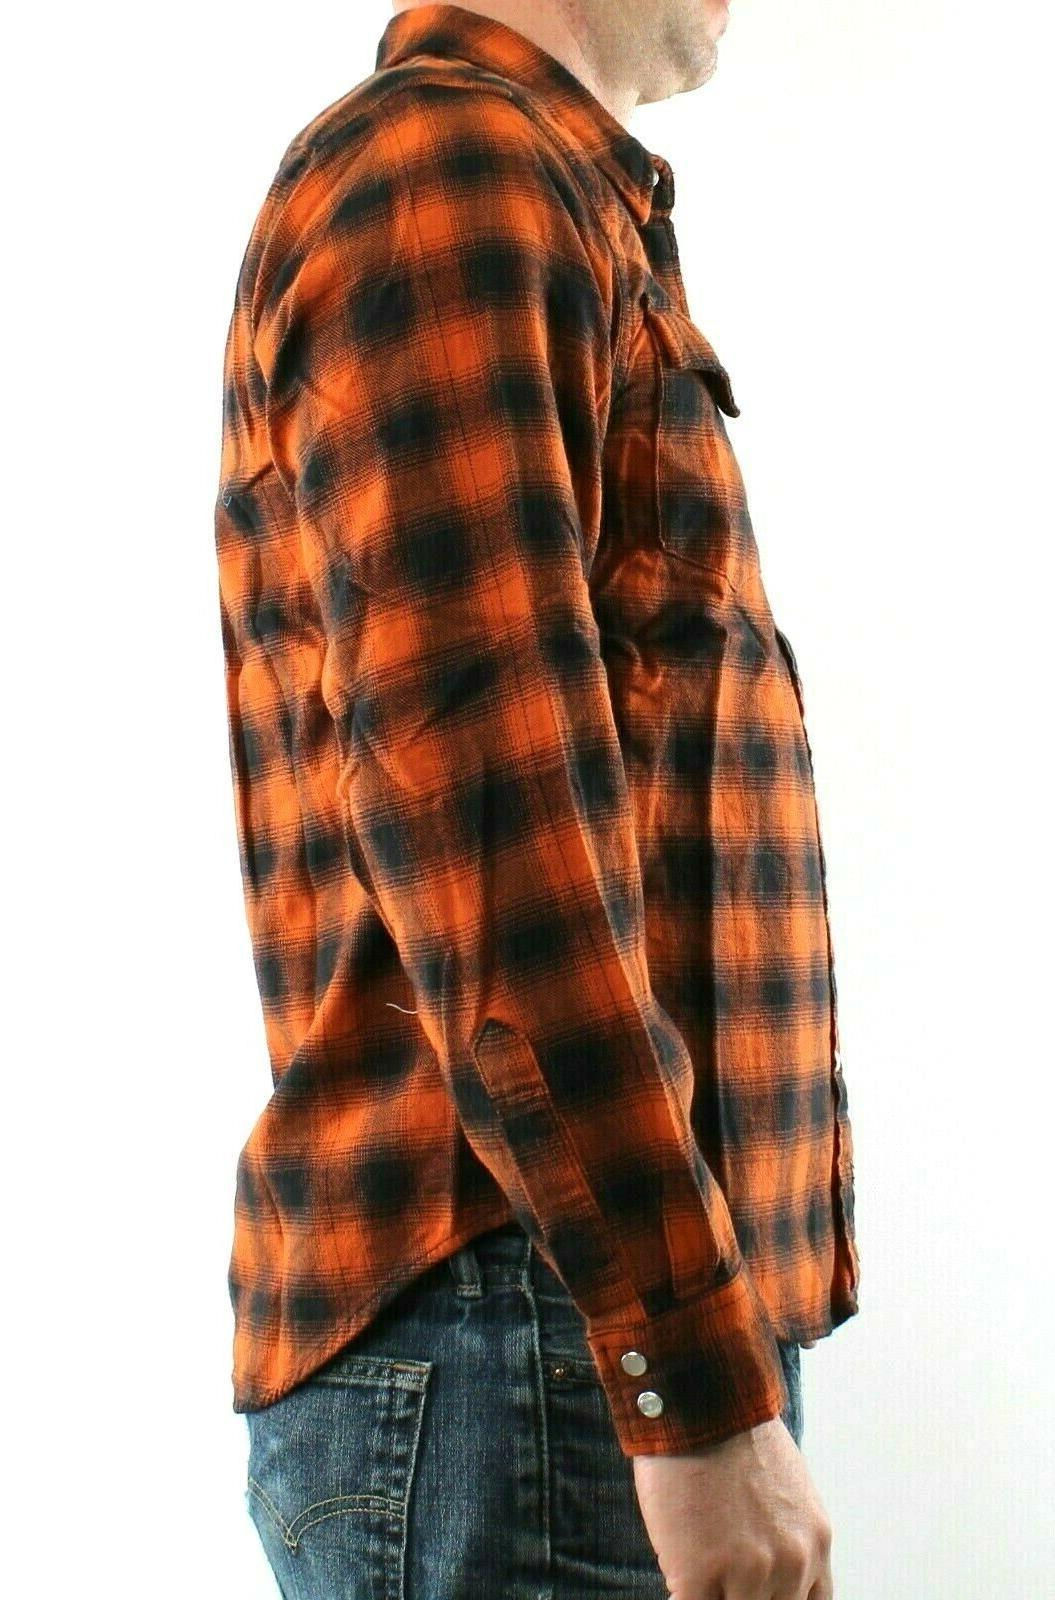 Wrangler Shirt Plaid 2 Pockets Western Snaps 100% Cotton